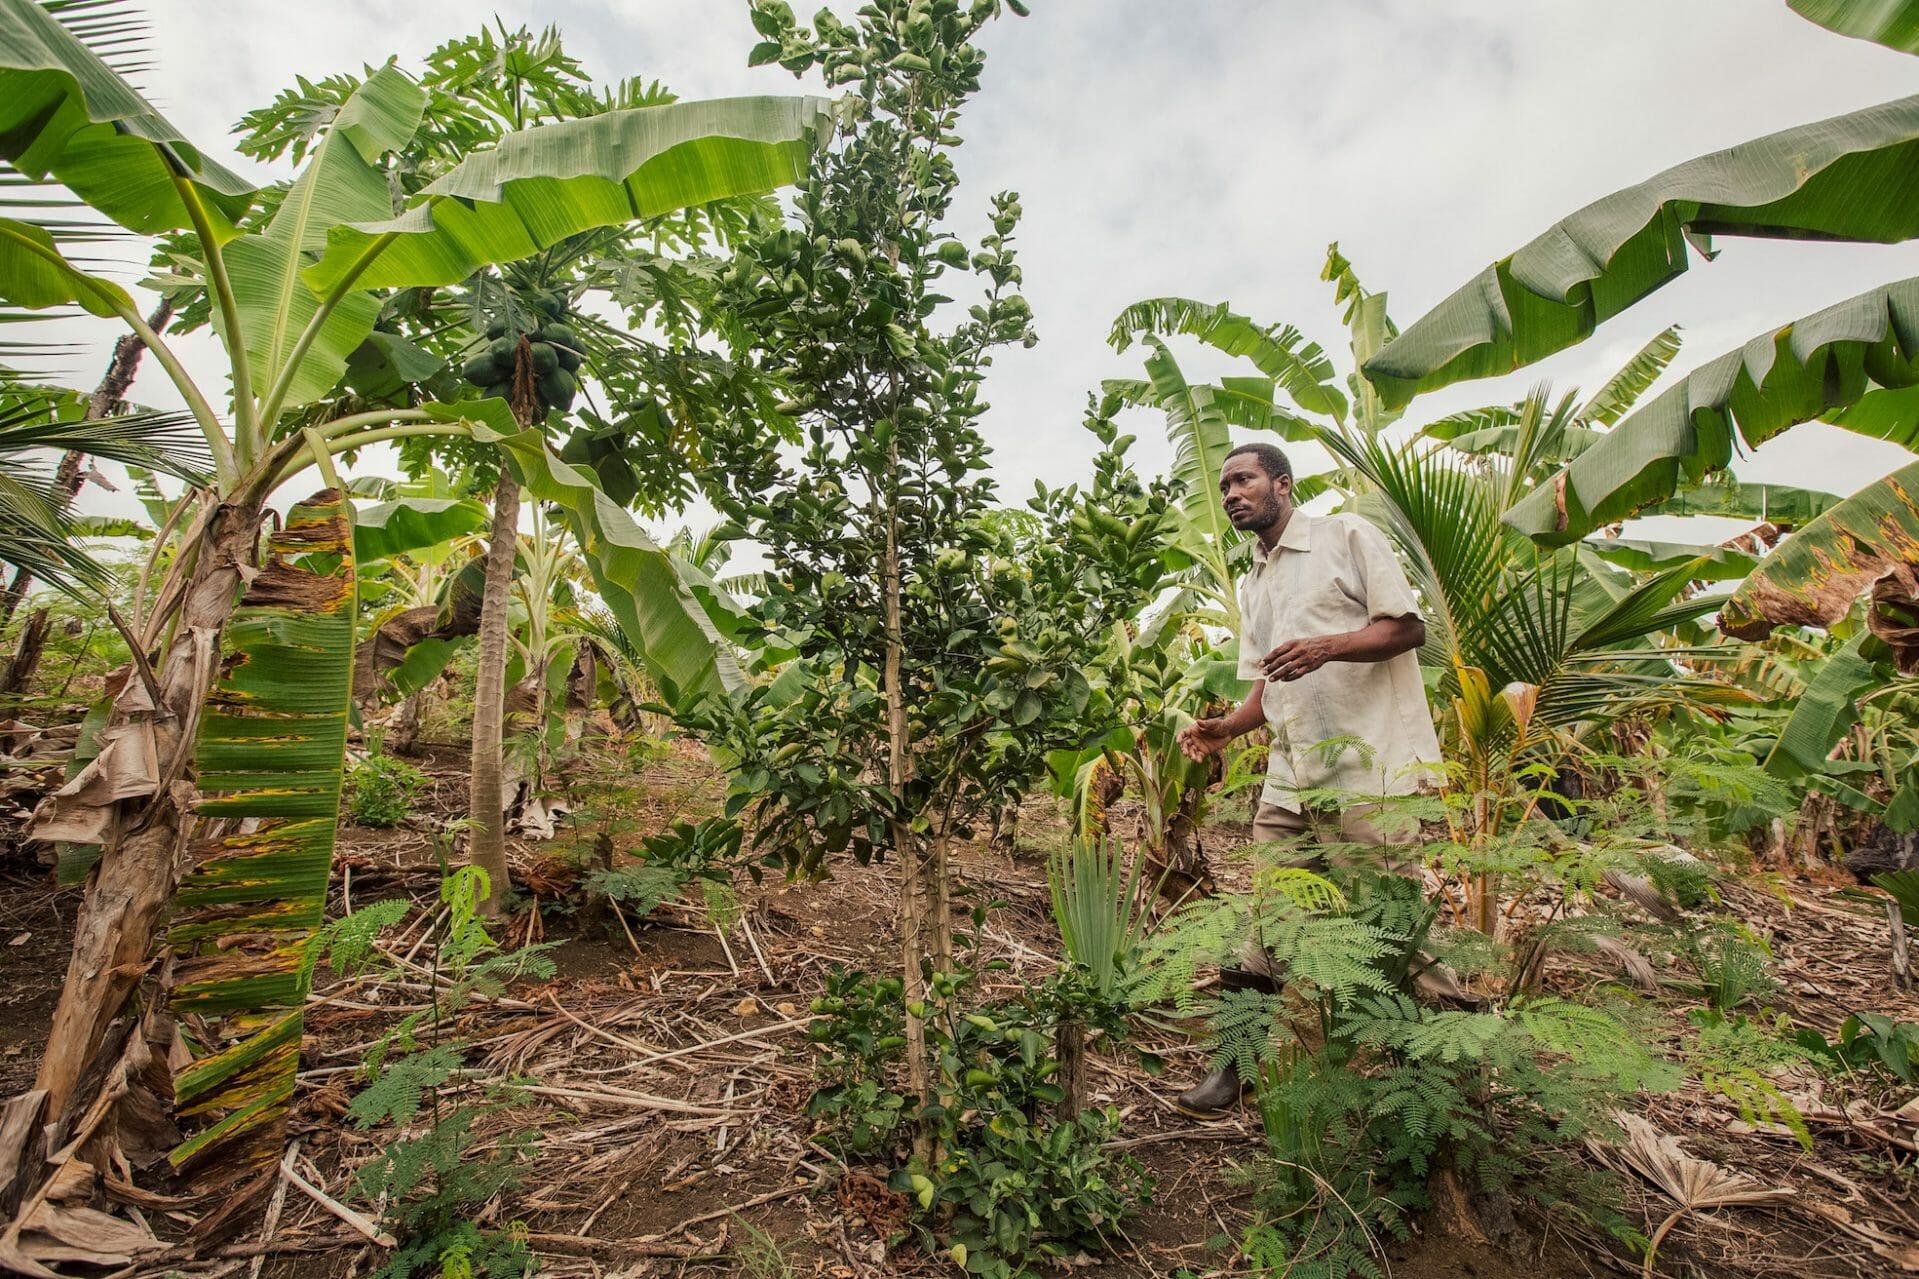 A man walks in an agroforest in Zanzibar.